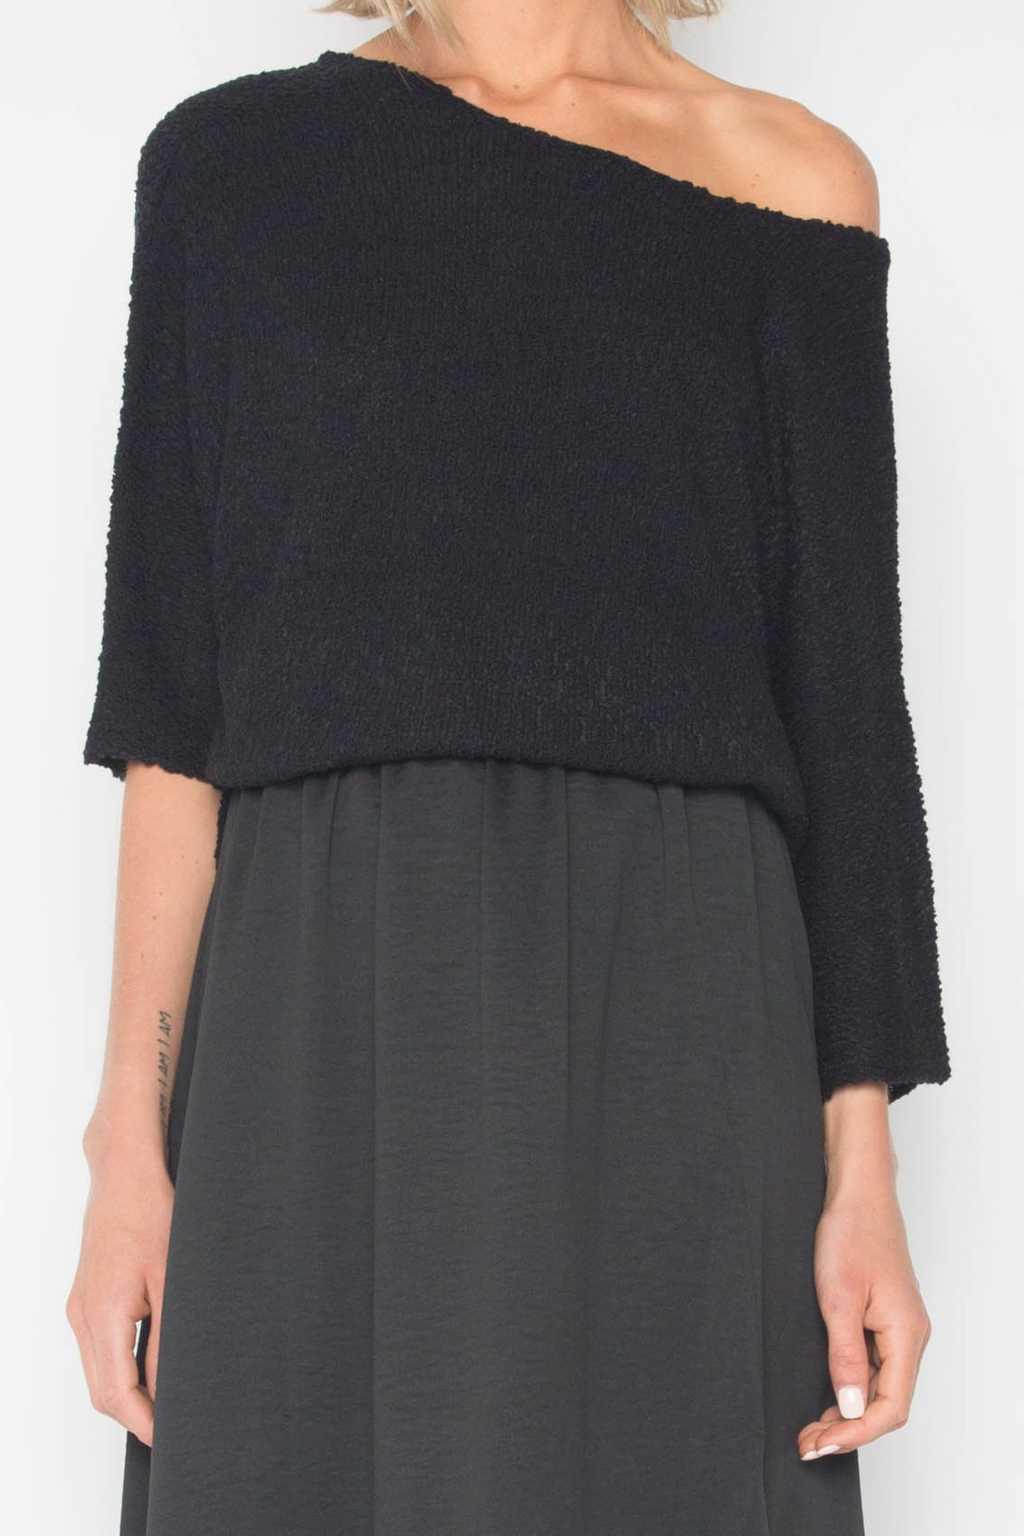 Sweater 1322 Black 2